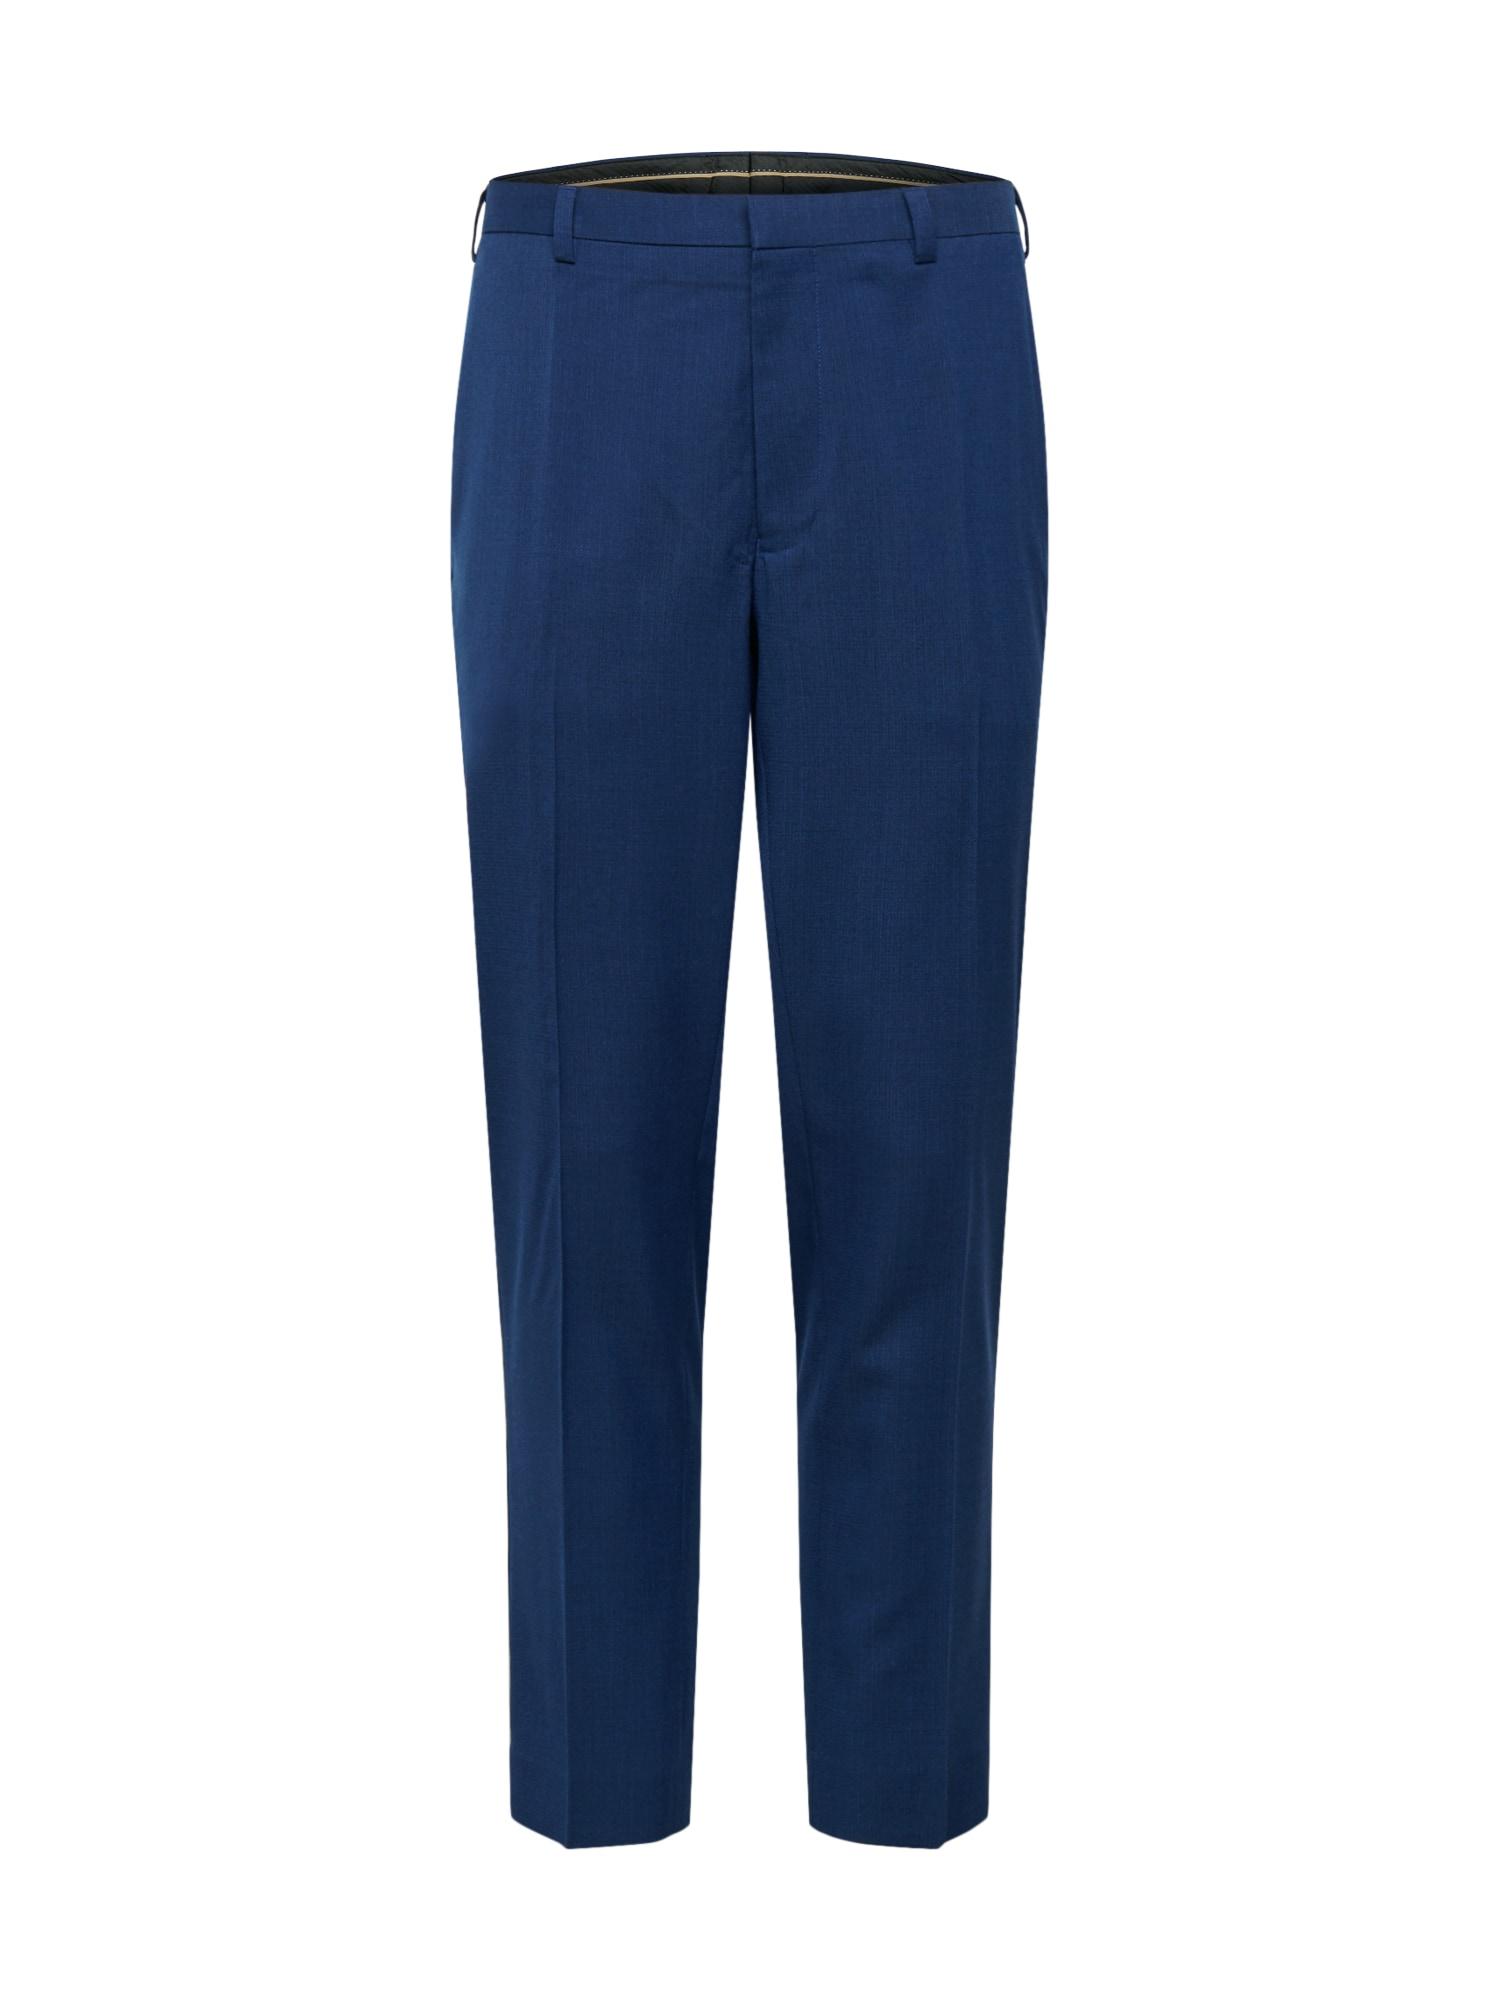 BURTON MENSWEAR LONDON Kelnės su kantu mėlyna